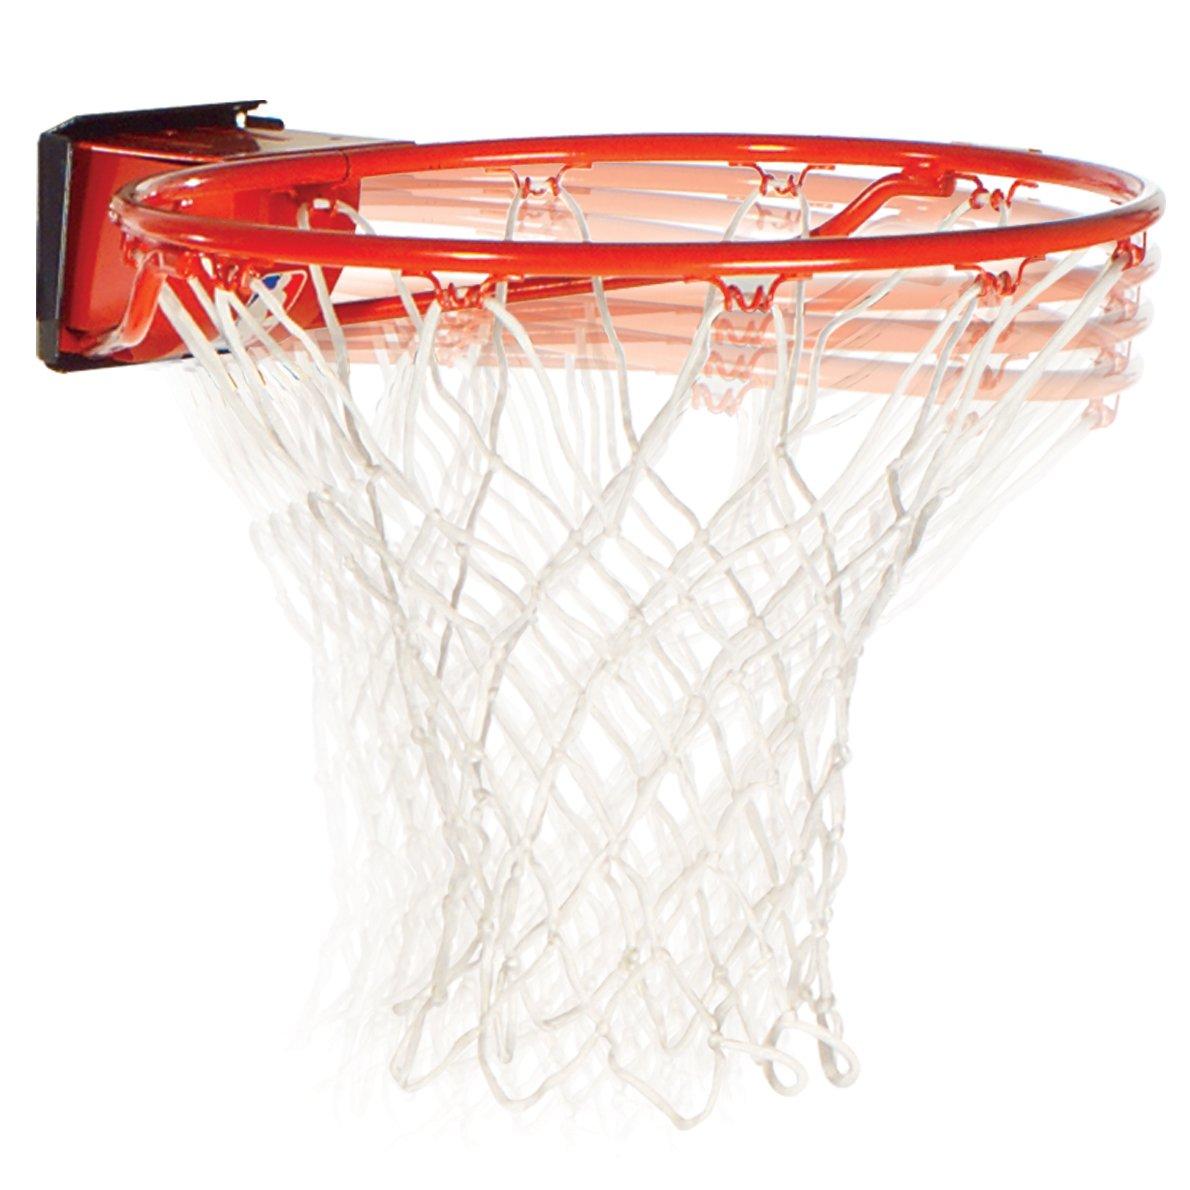 Spalding Pro Slam Basketball Rim, Black 7888BSR